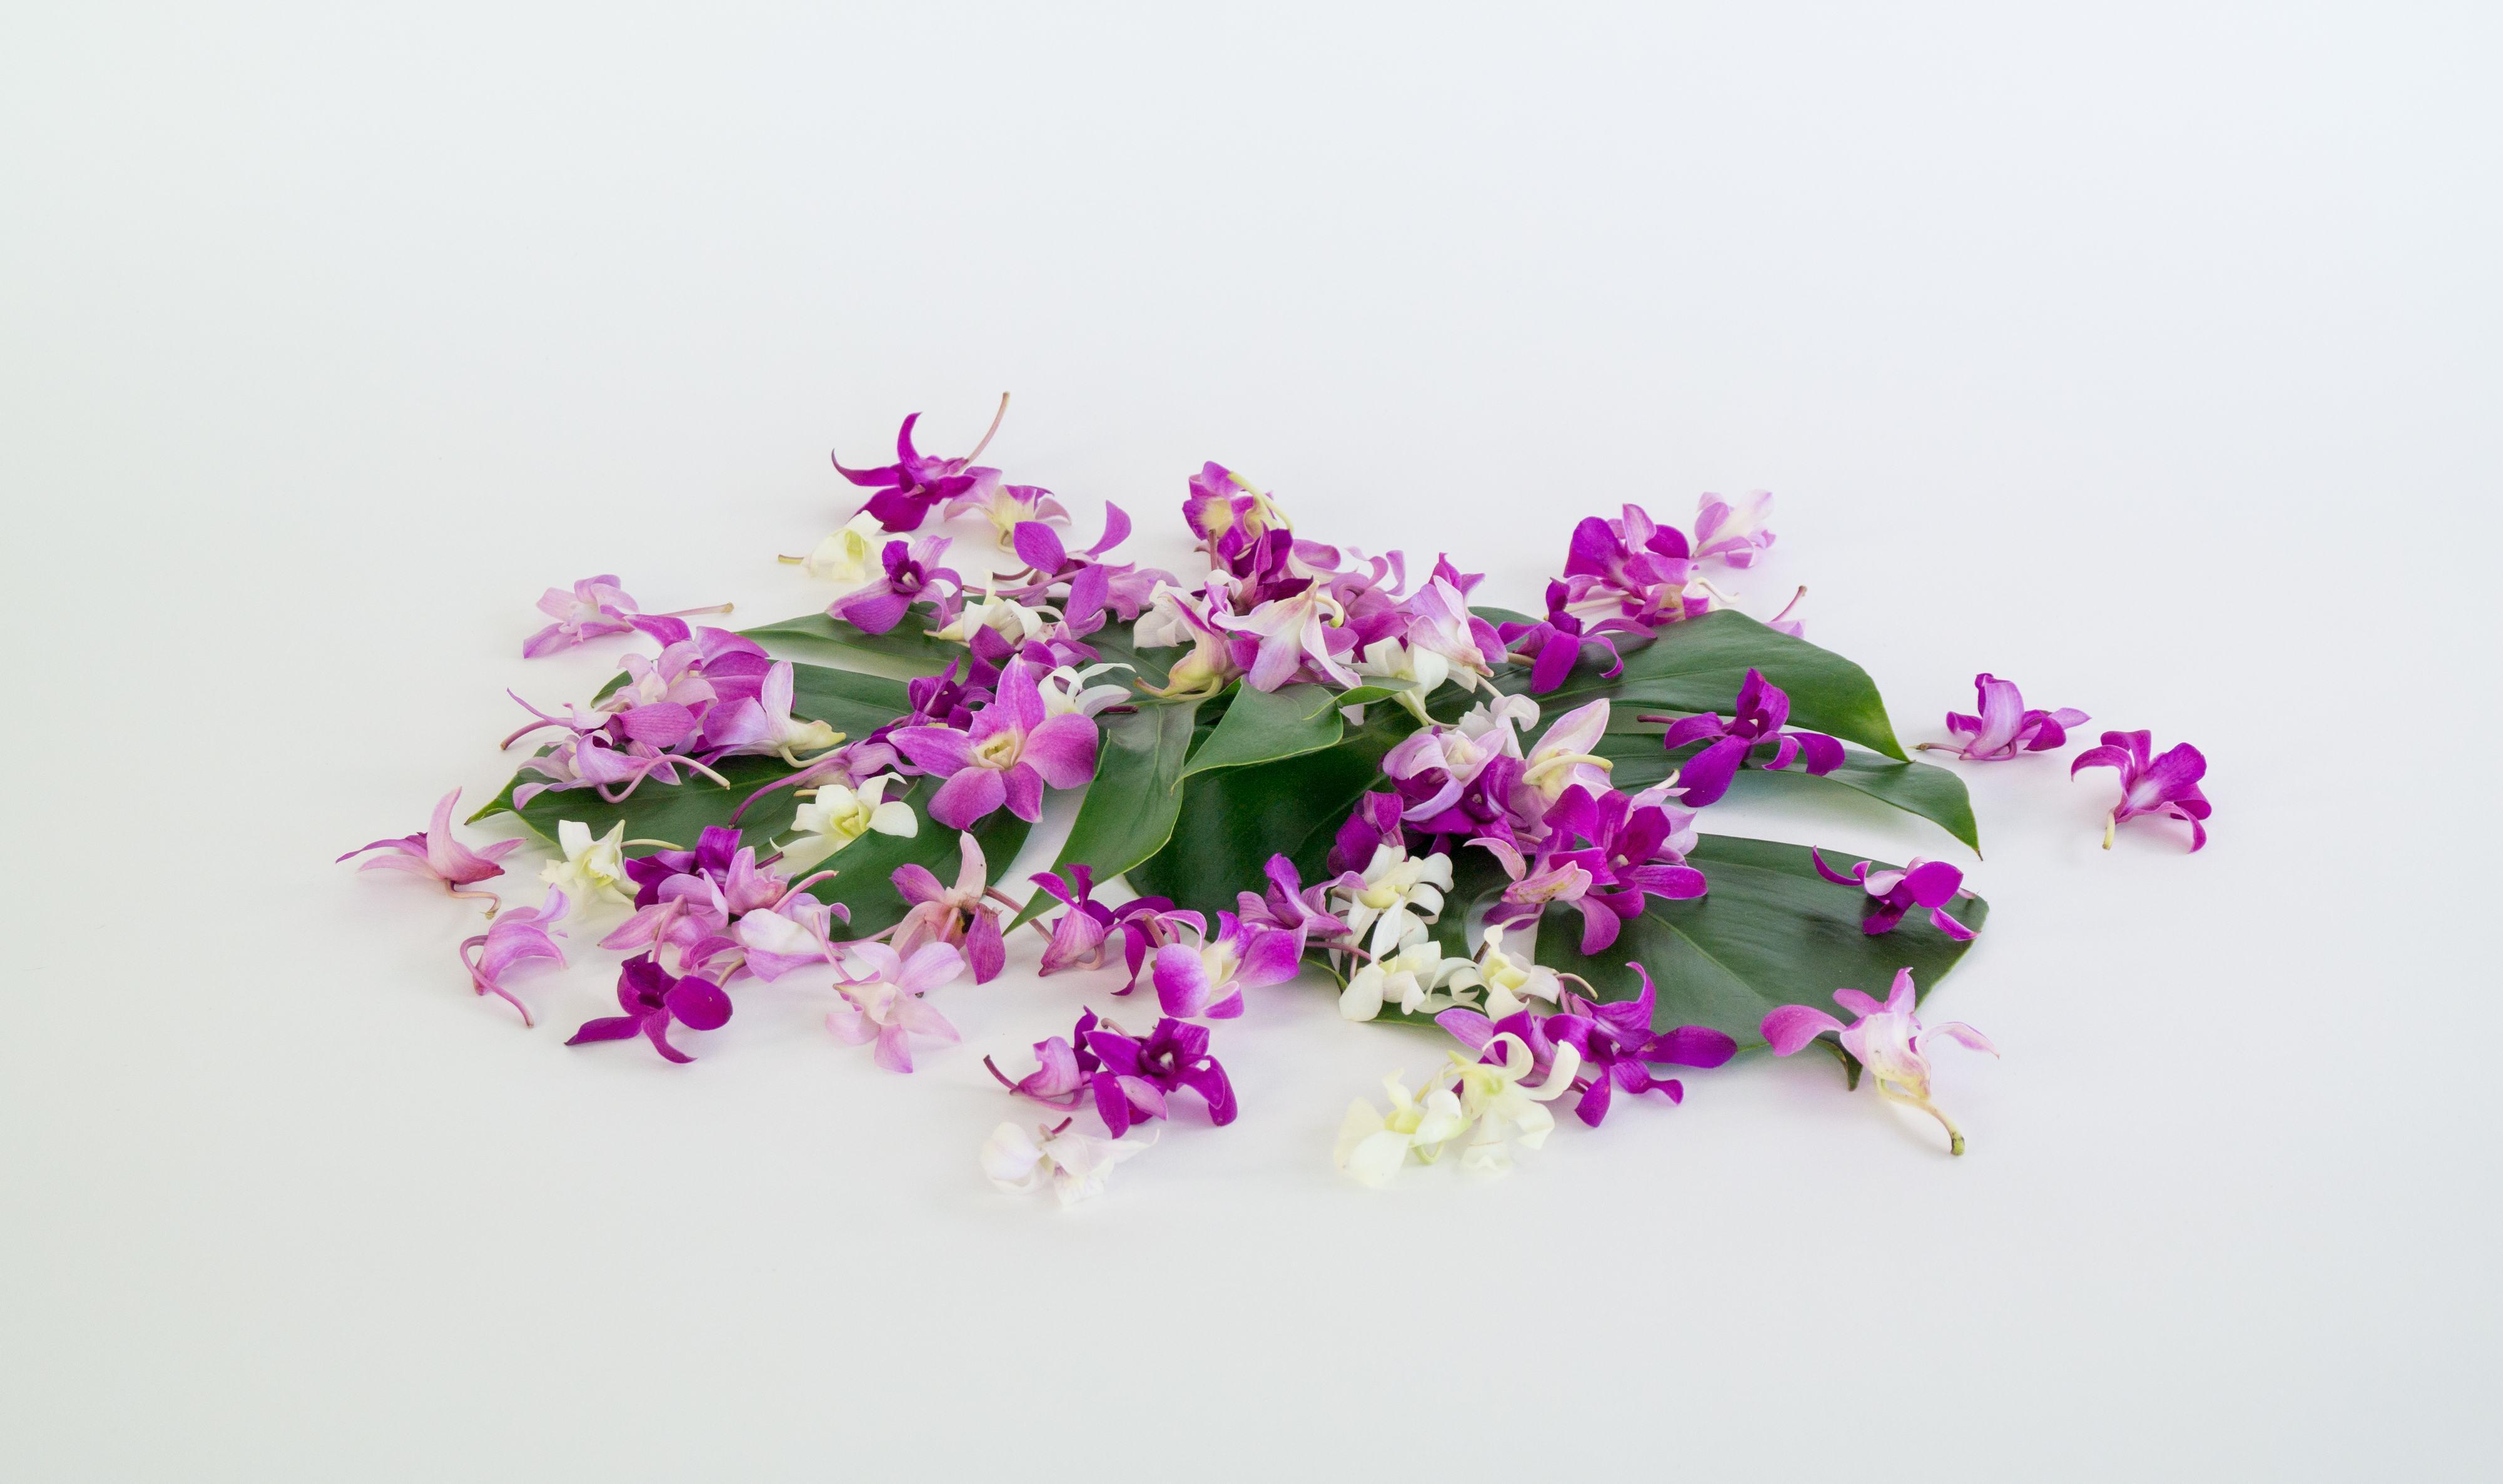 Loose orchid blooms fresh hawaiian orchids back to hawaiian weddingsloose orchid blossomsmost popular gifts izmirmasajfo